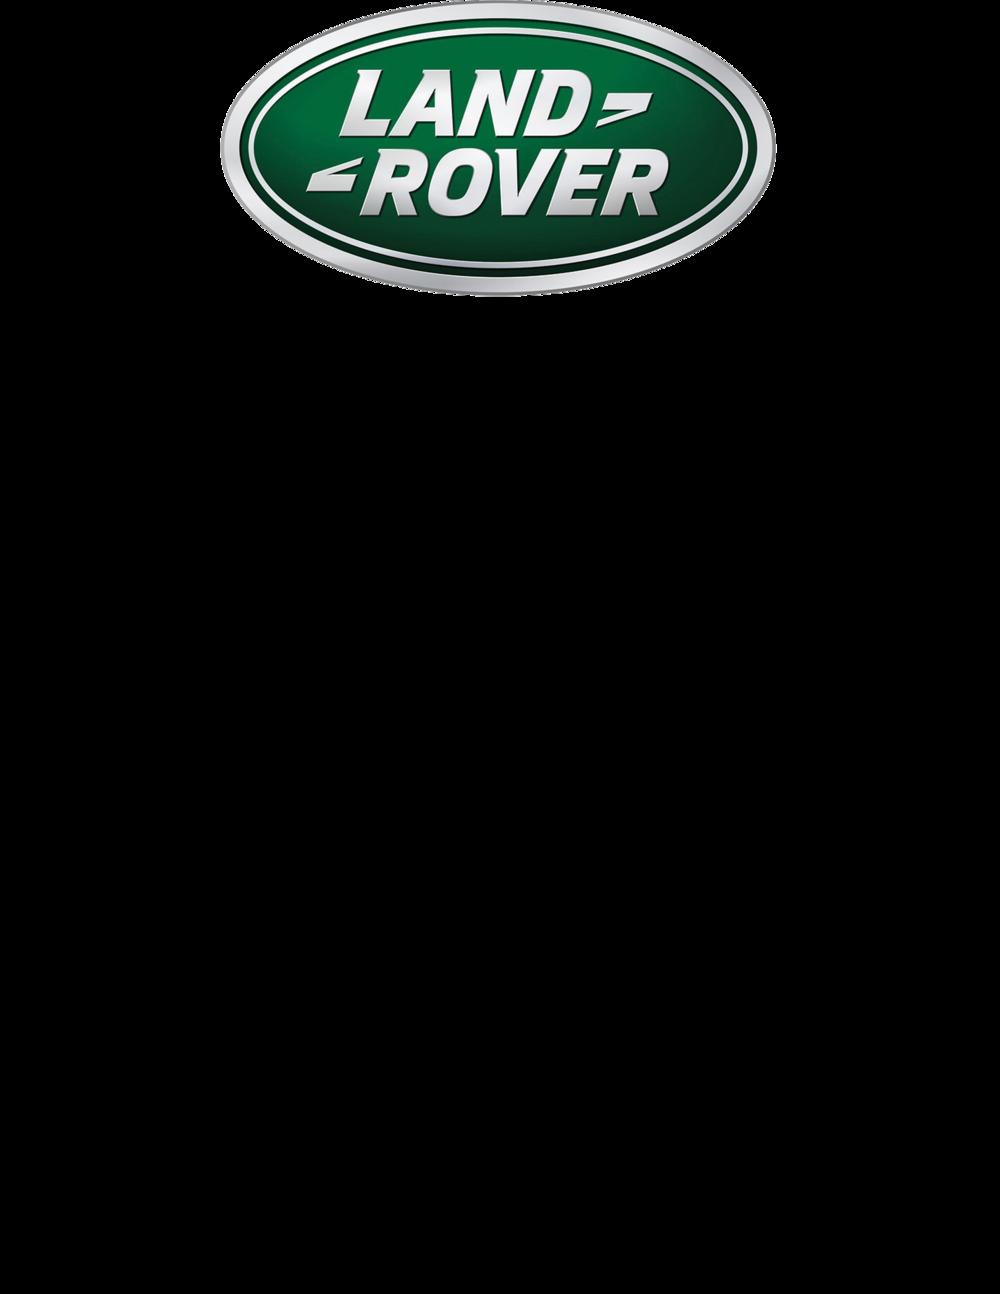 Land-Rover-Logo-6.jpg